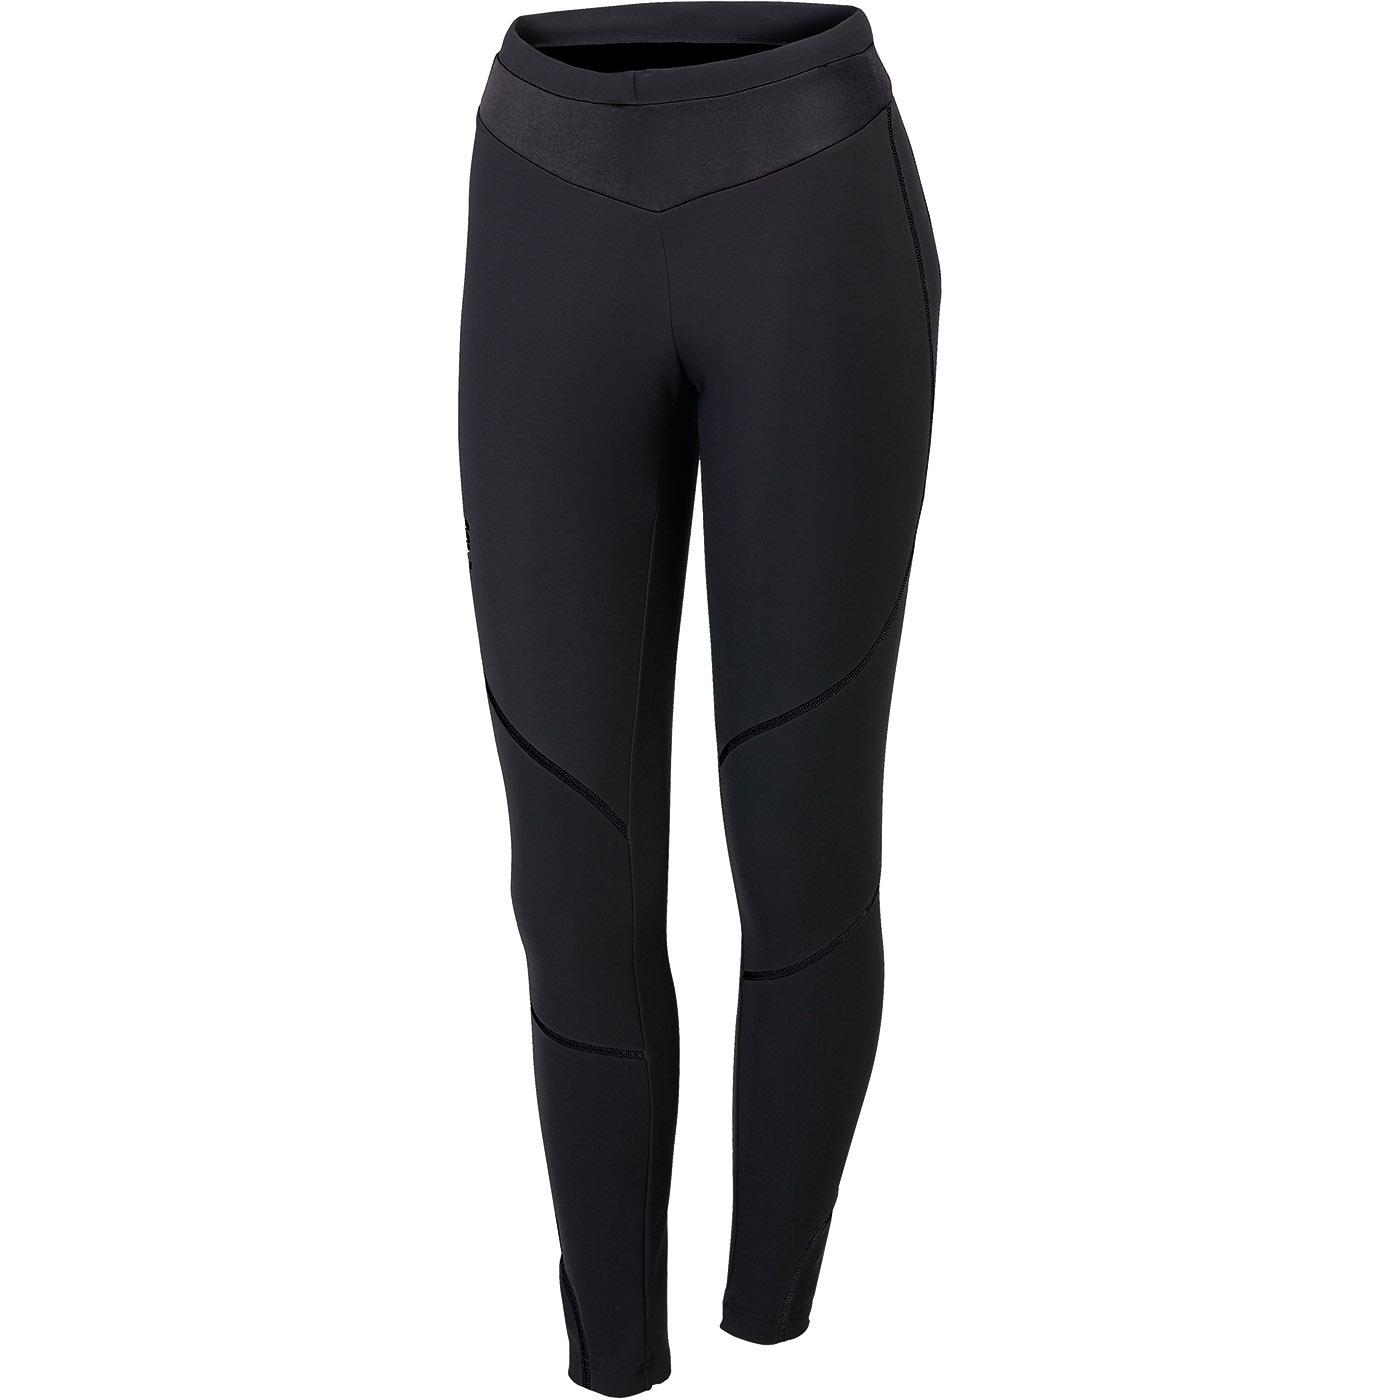 1b840ca070de Sportful Cardio Evo Tech dámske nohavice čierna